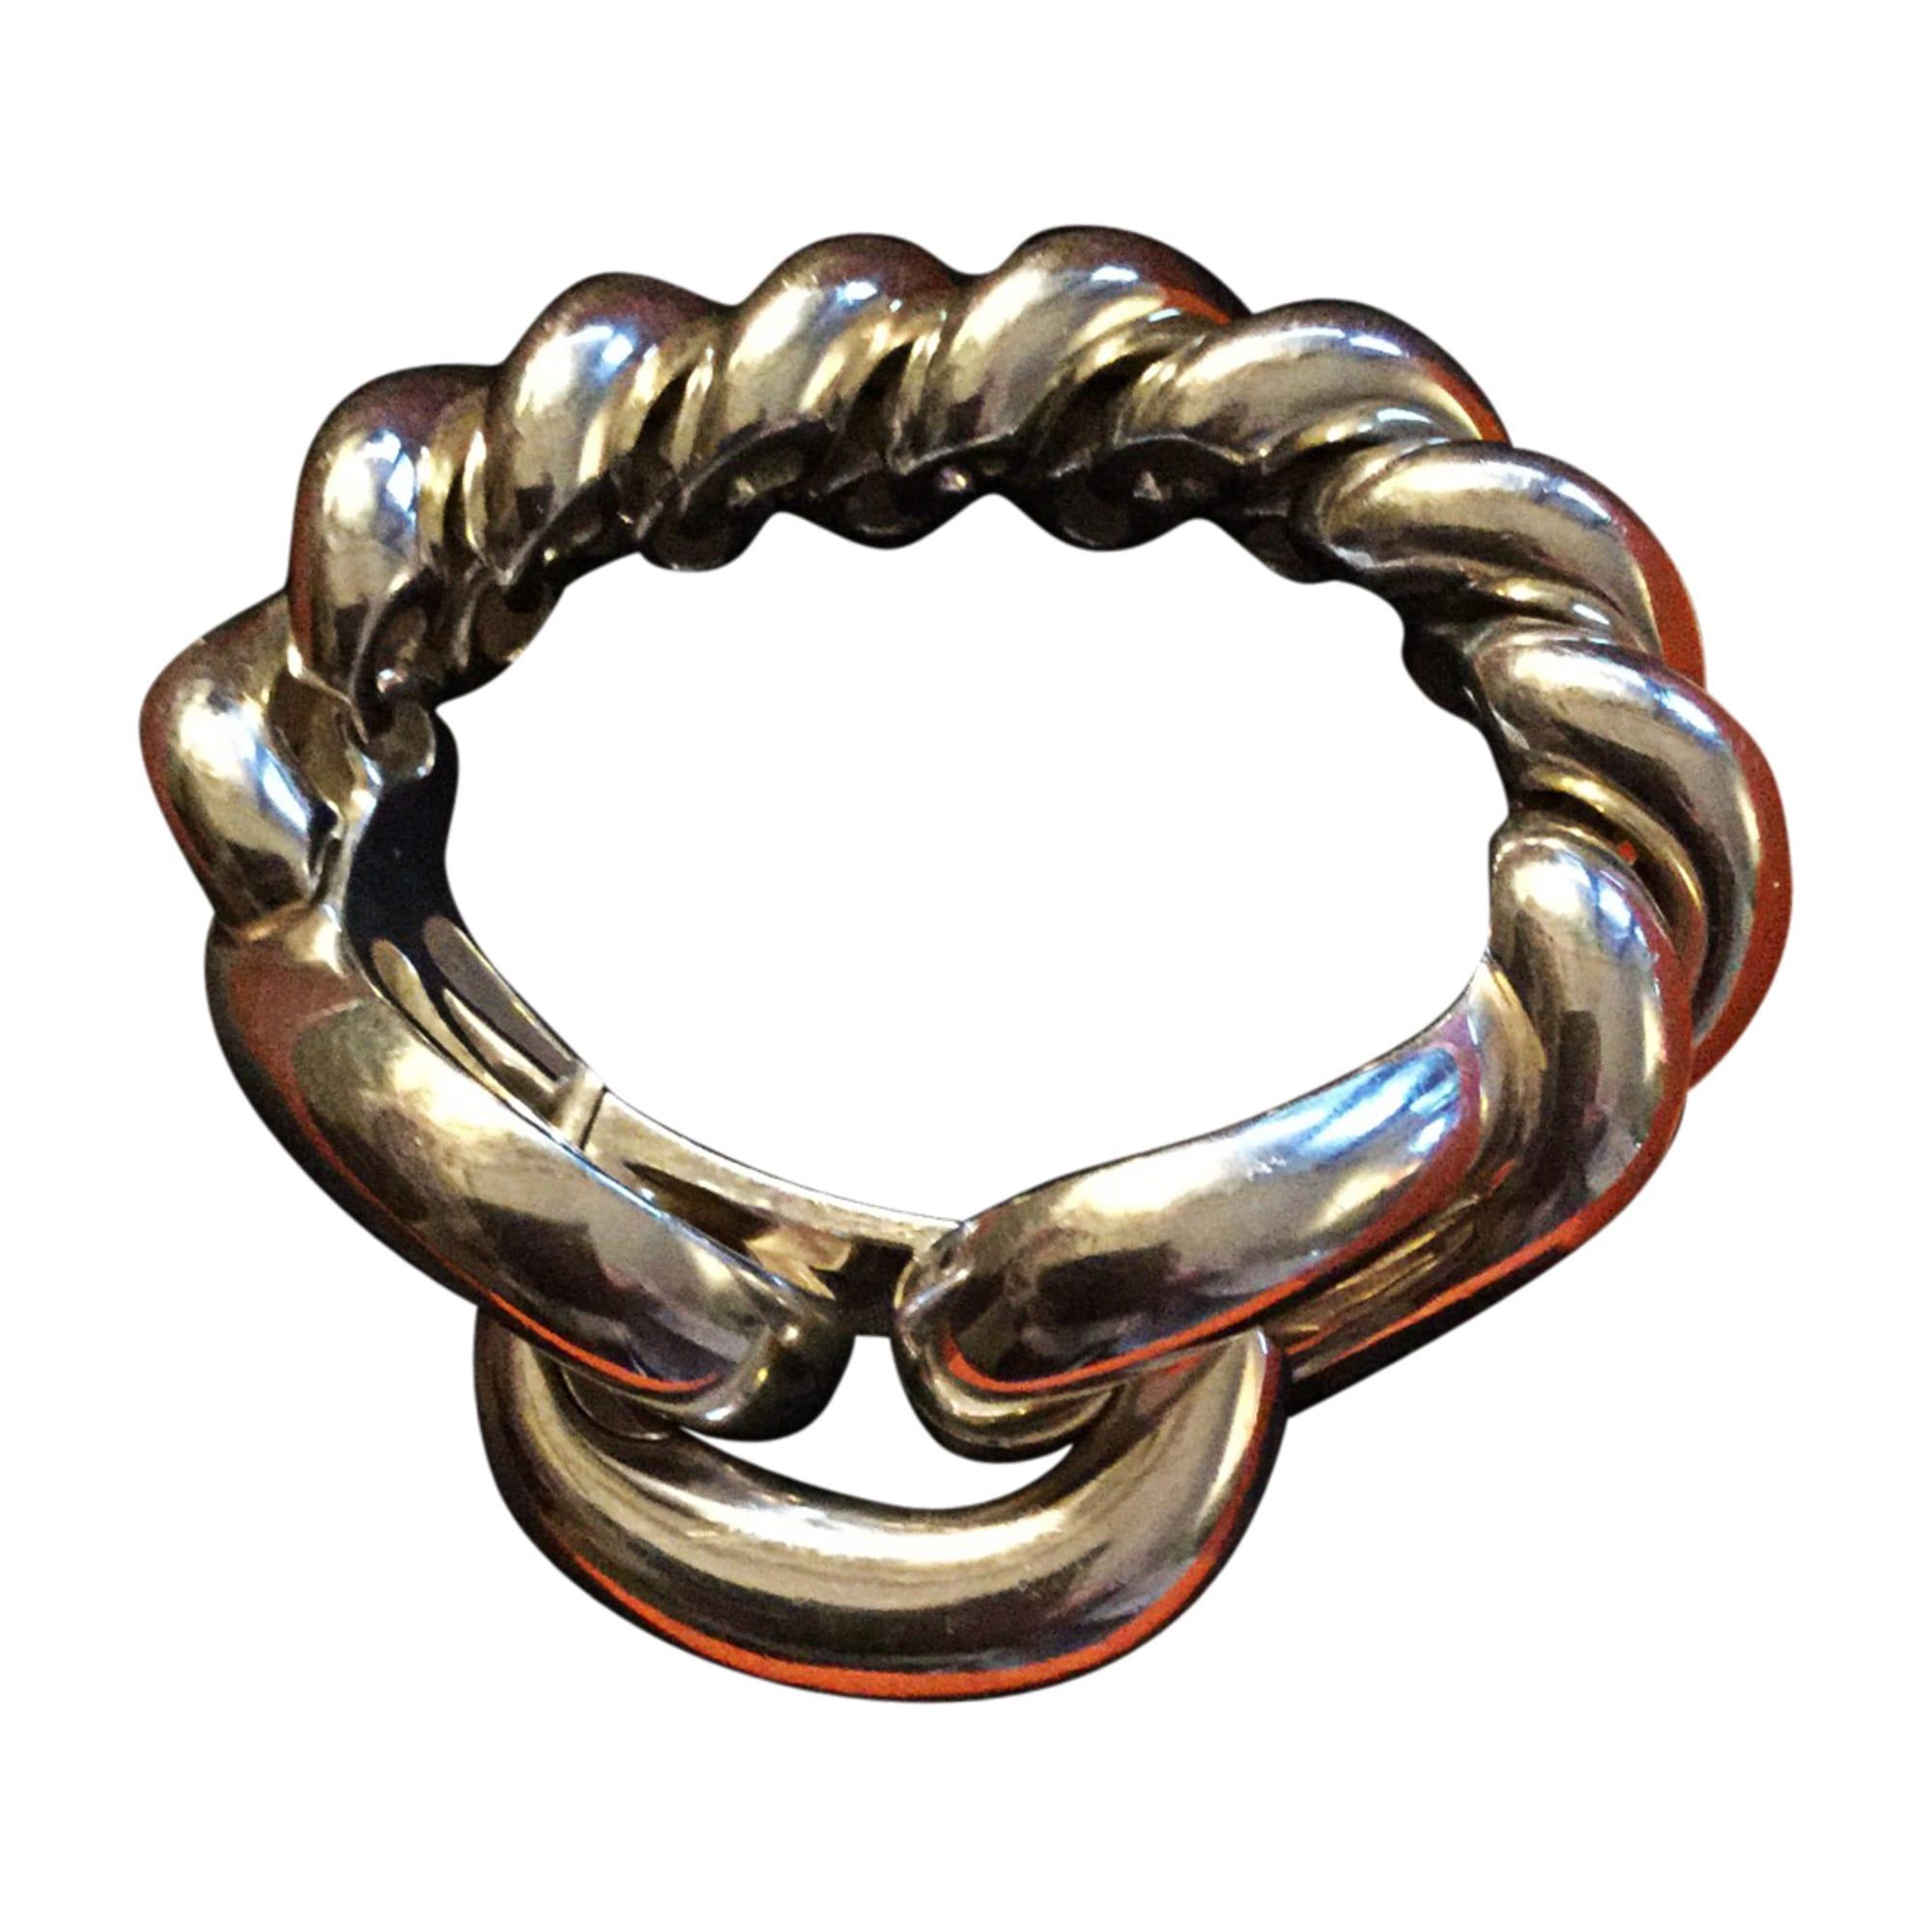 ... argent 925 37851 1820e reduced bracelet hermÈs silver c447e 63ca3 ... 920868c090a